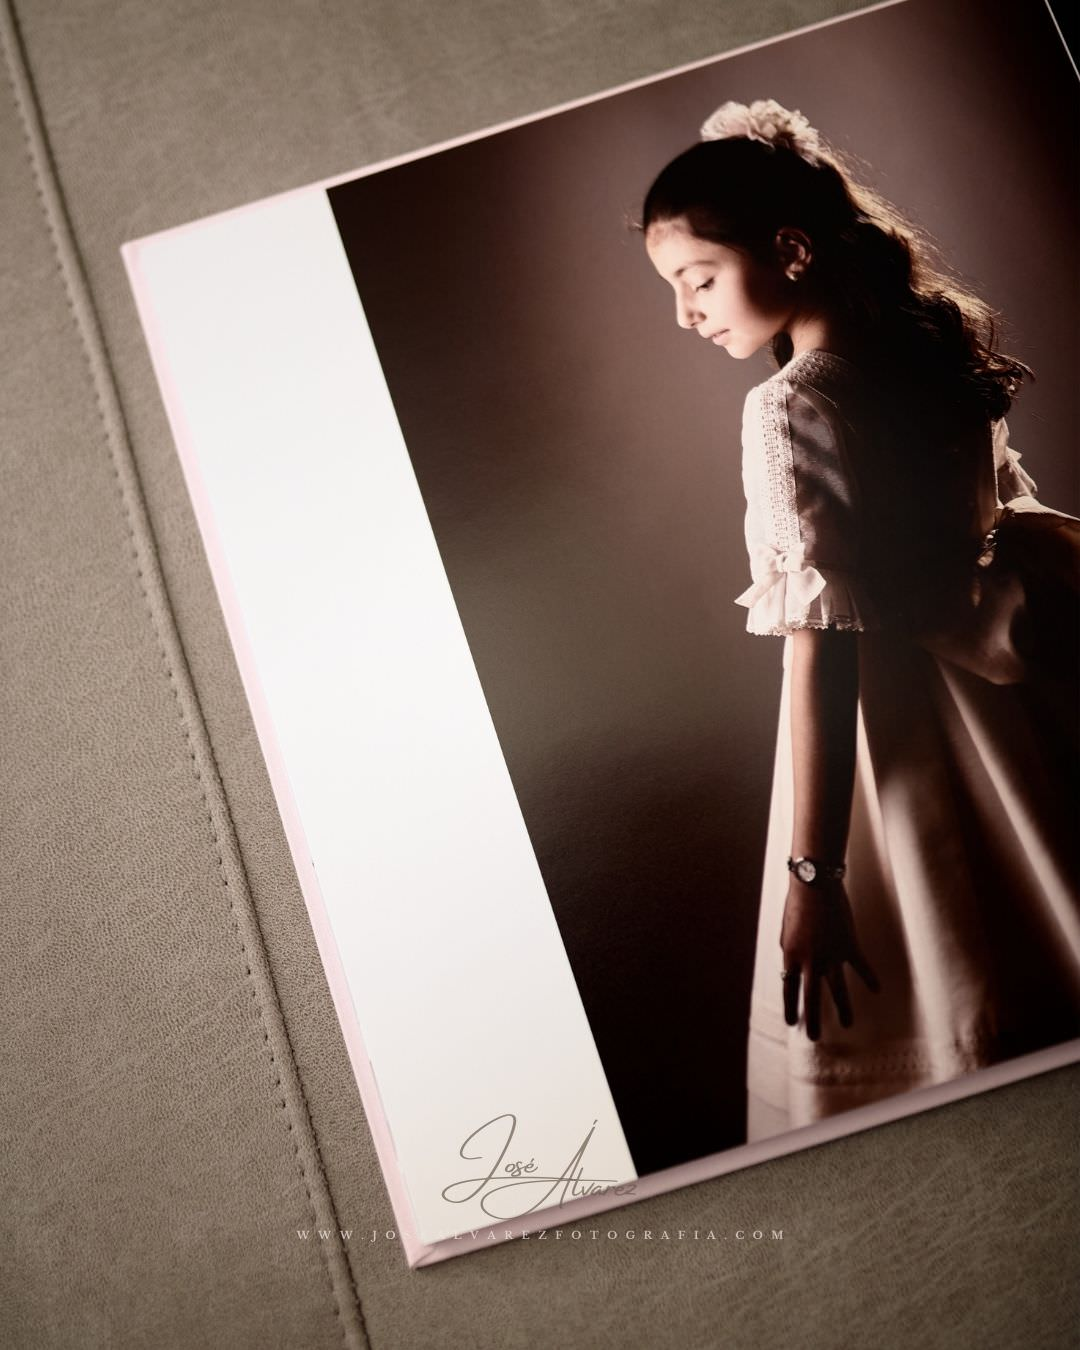 Álbum de Primera Comunión - Inés - José Álvarez Fotografía